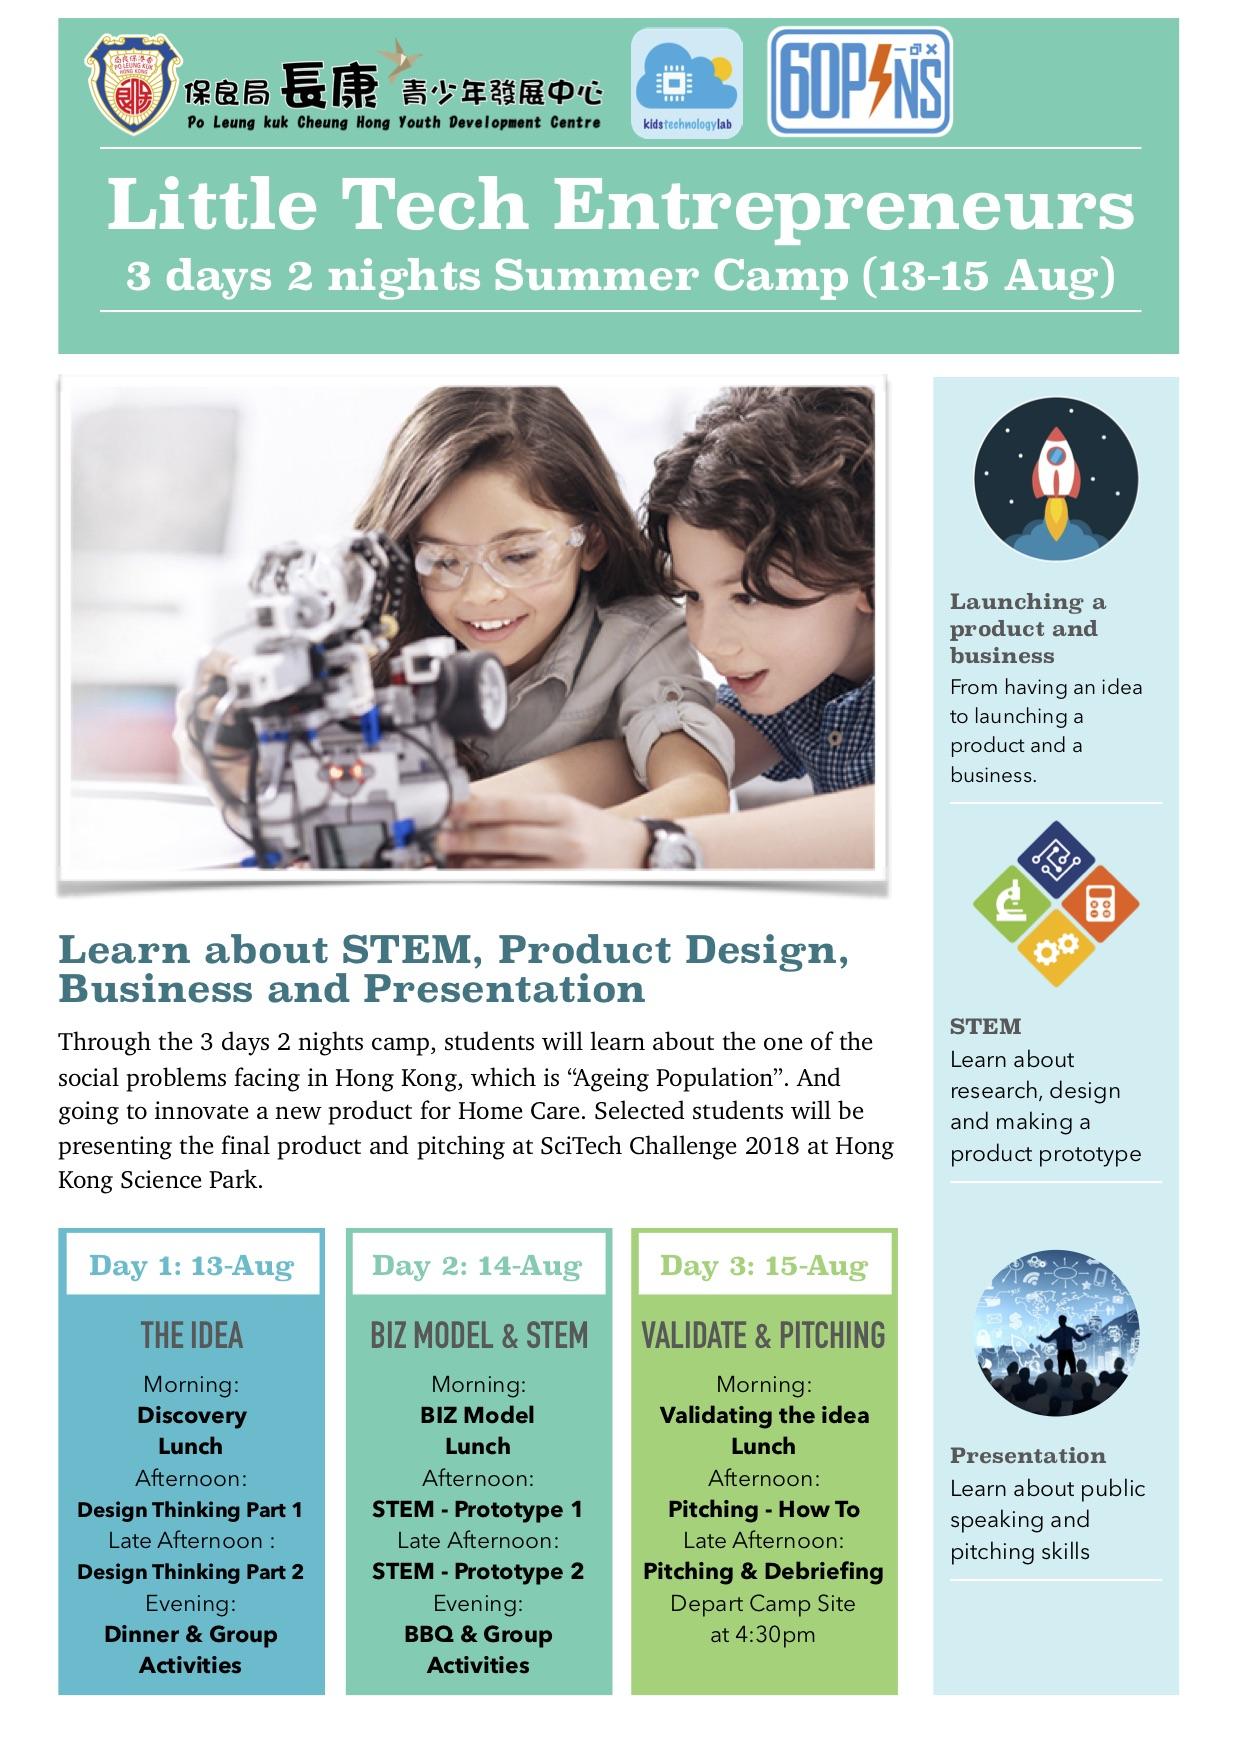 Little Tech Entrepreneurs 3 days 2 nights Summer Camp (13-15 Aug)